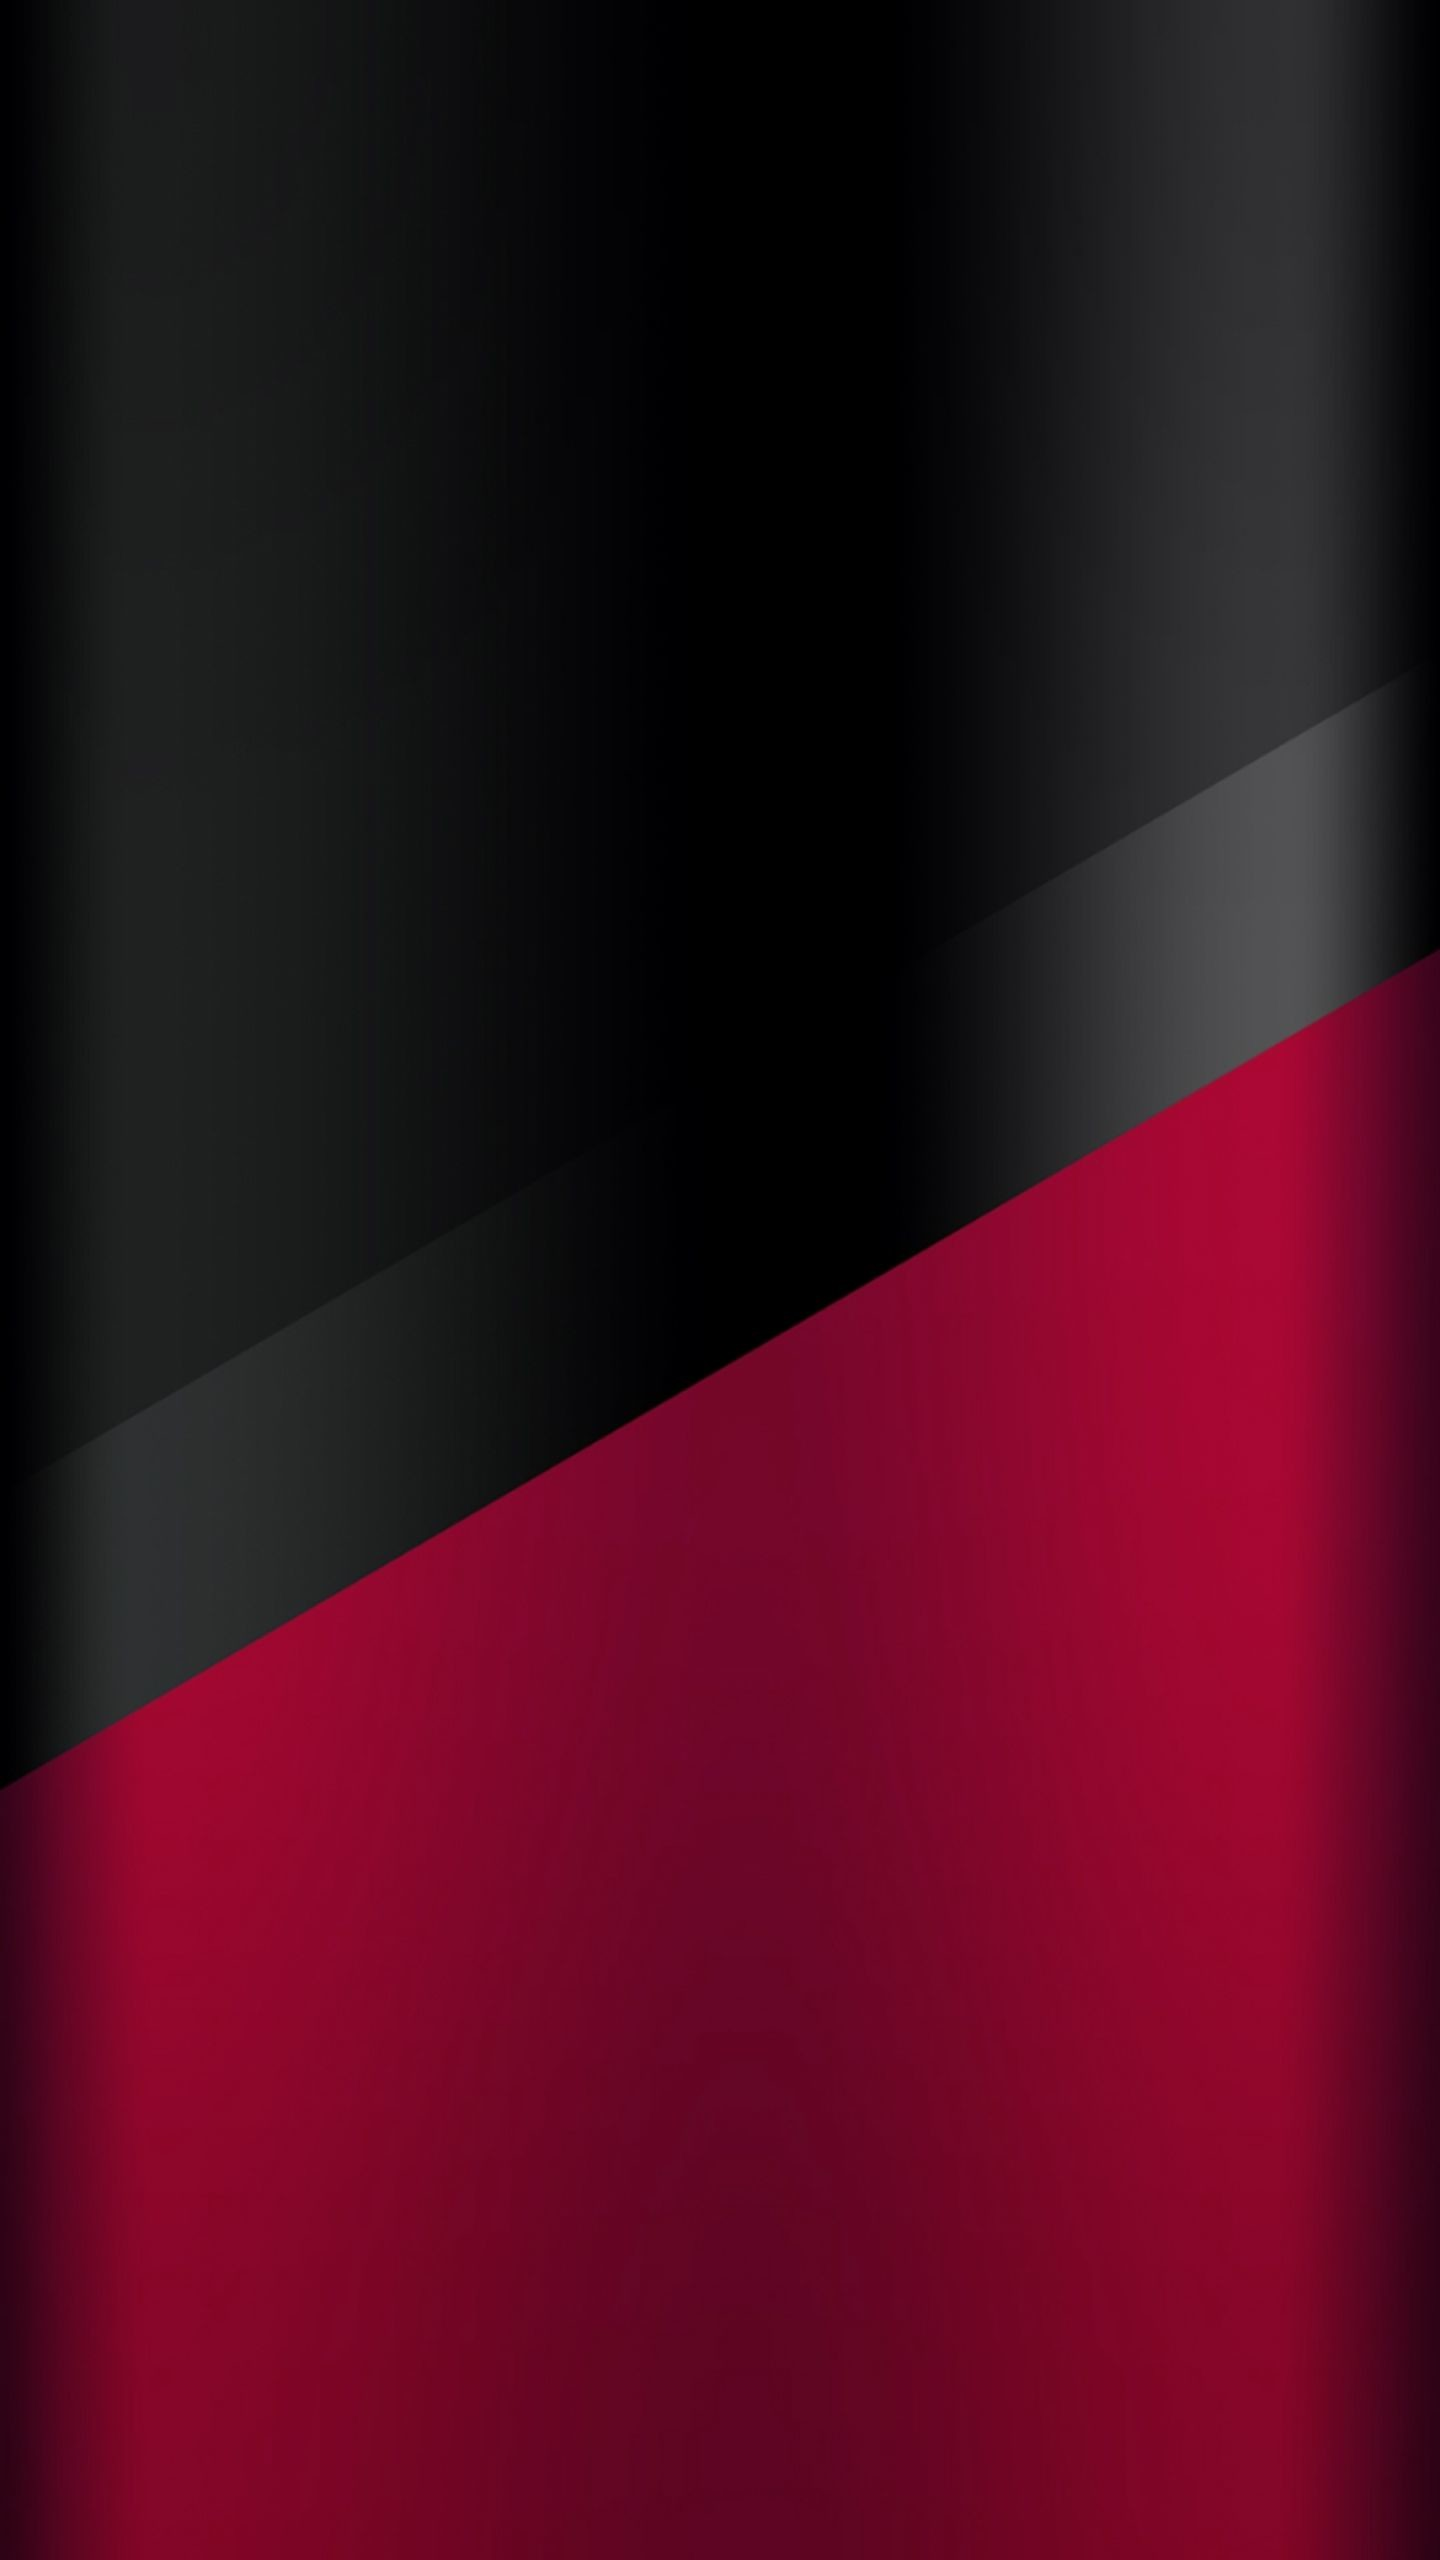 Wallpaper Galaxy S7 Posted By John Mercado